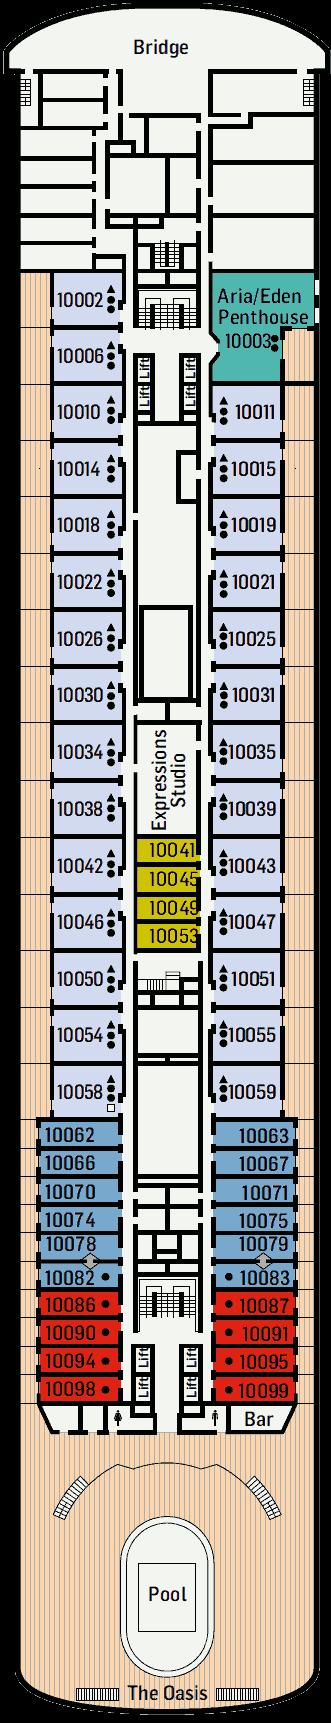 Pacific Aria Deck 10